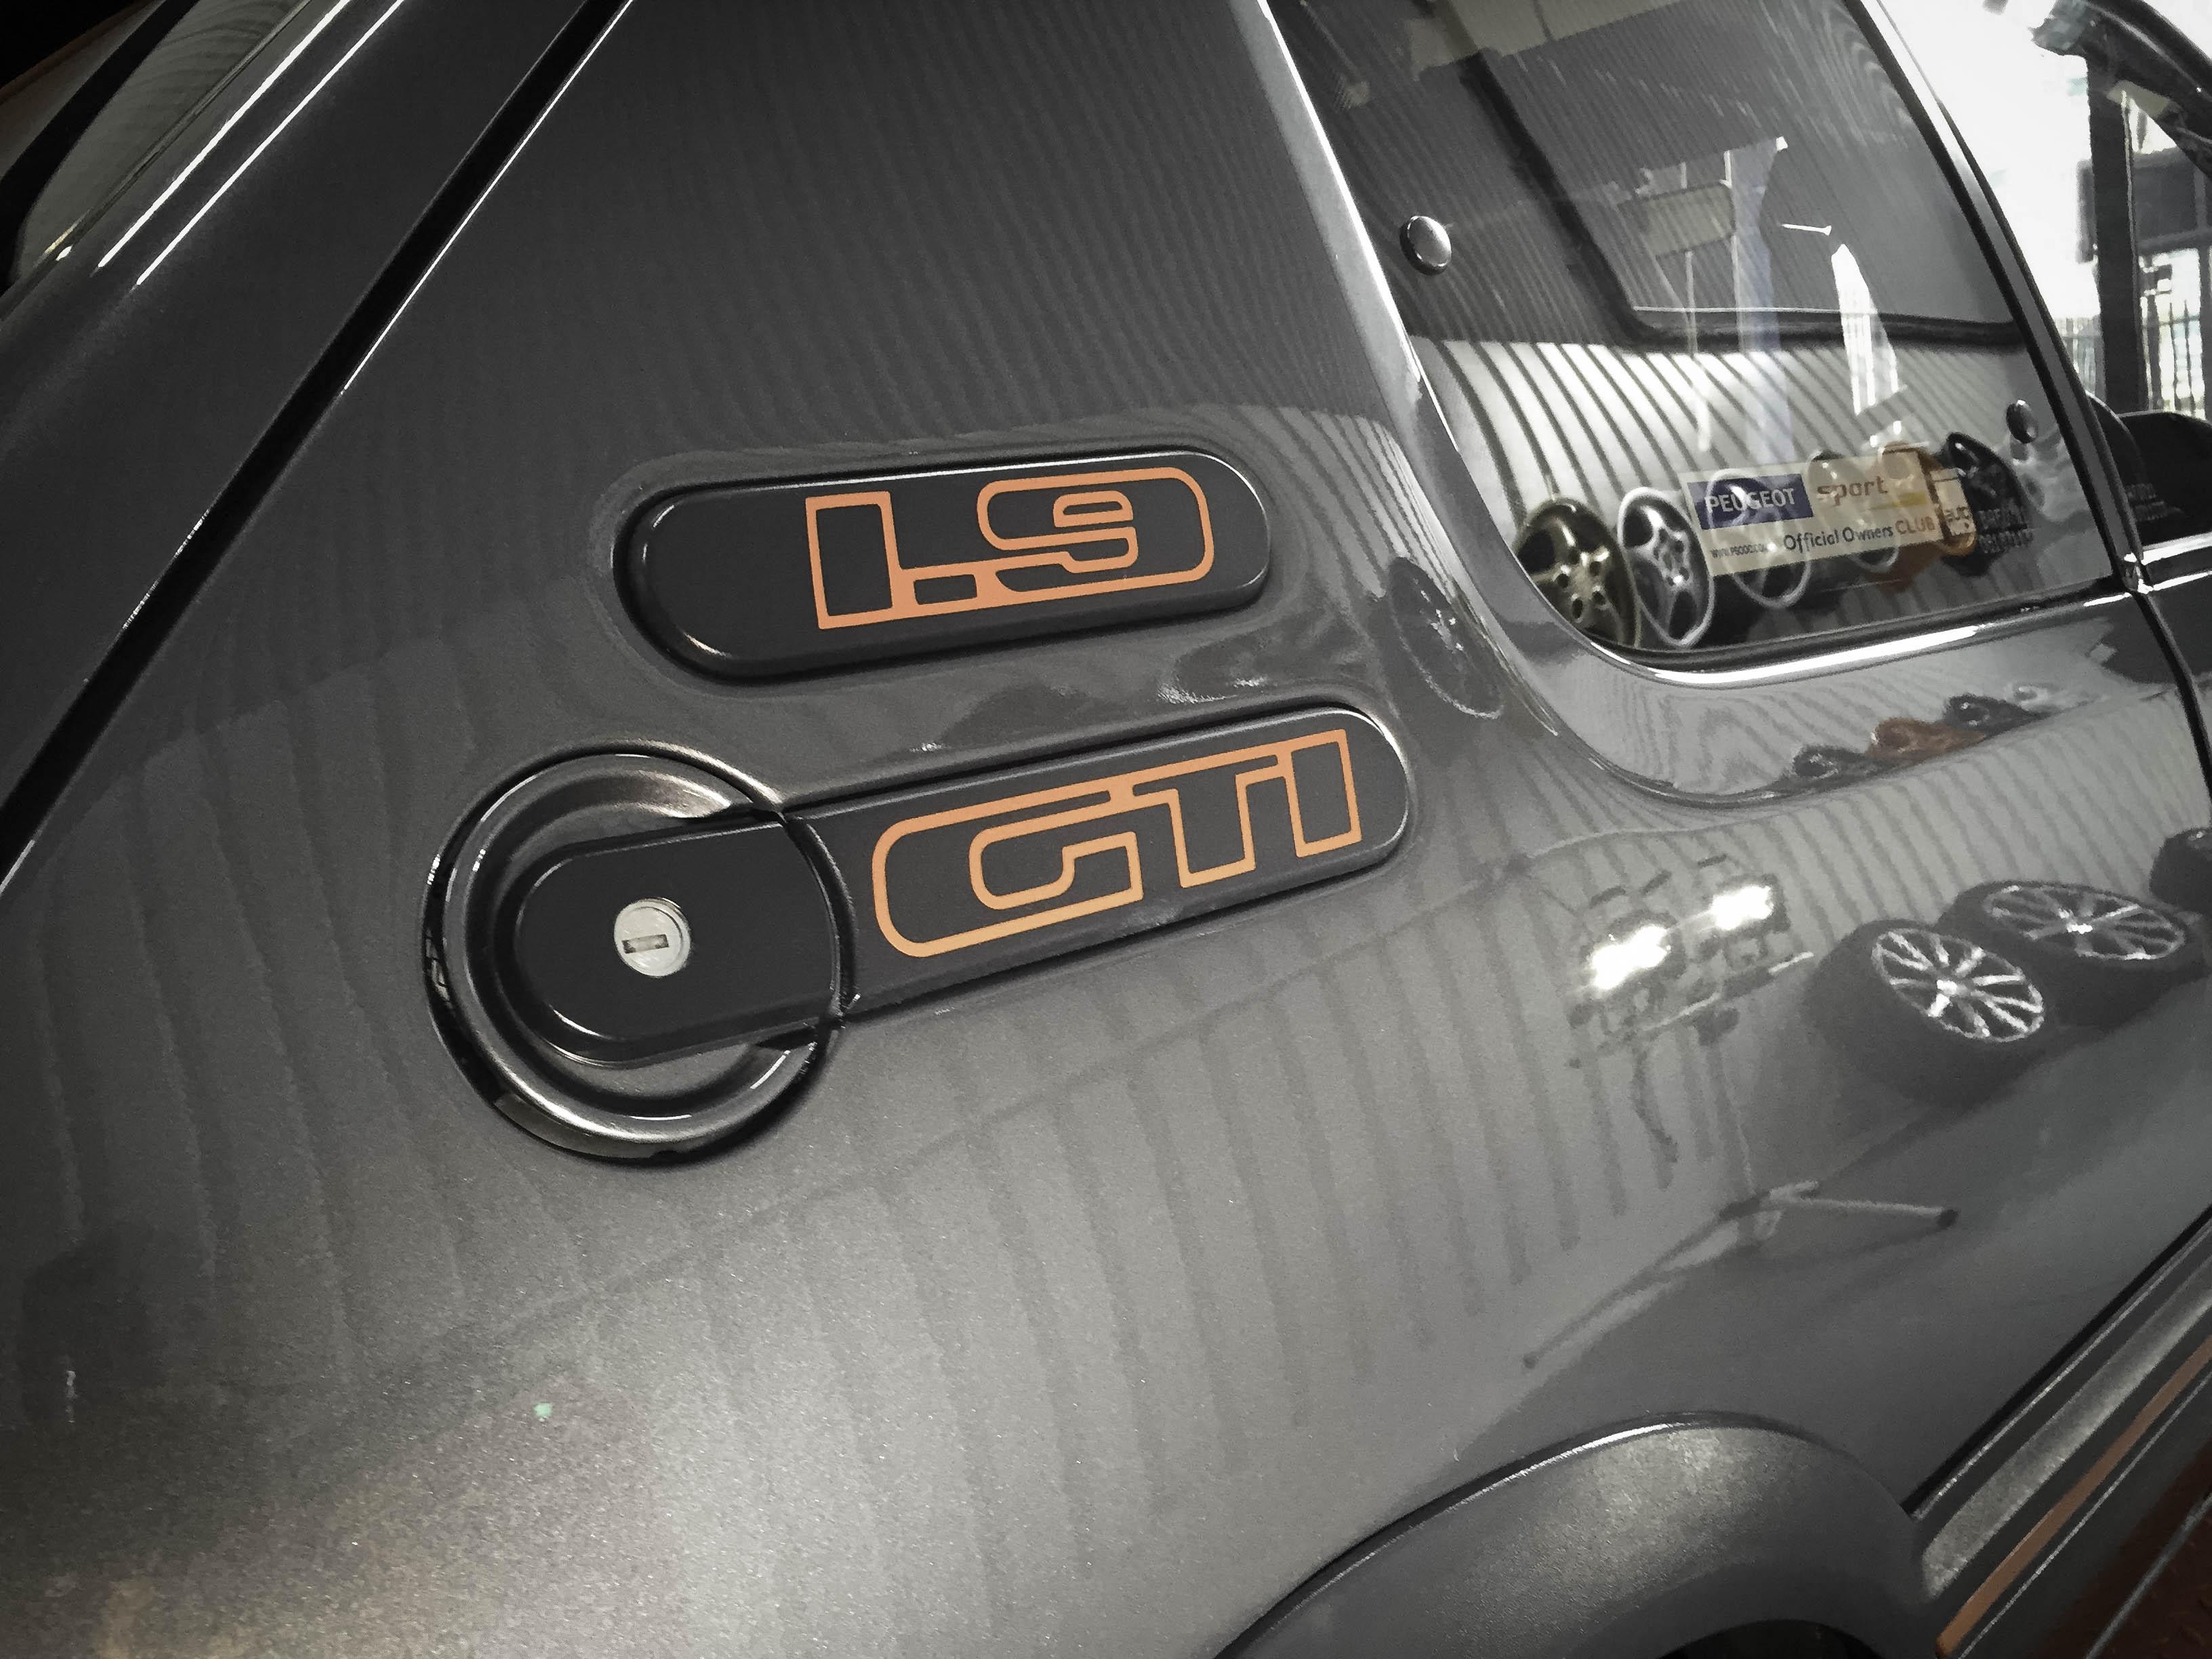 Peugot 1.9 GTi – Badges